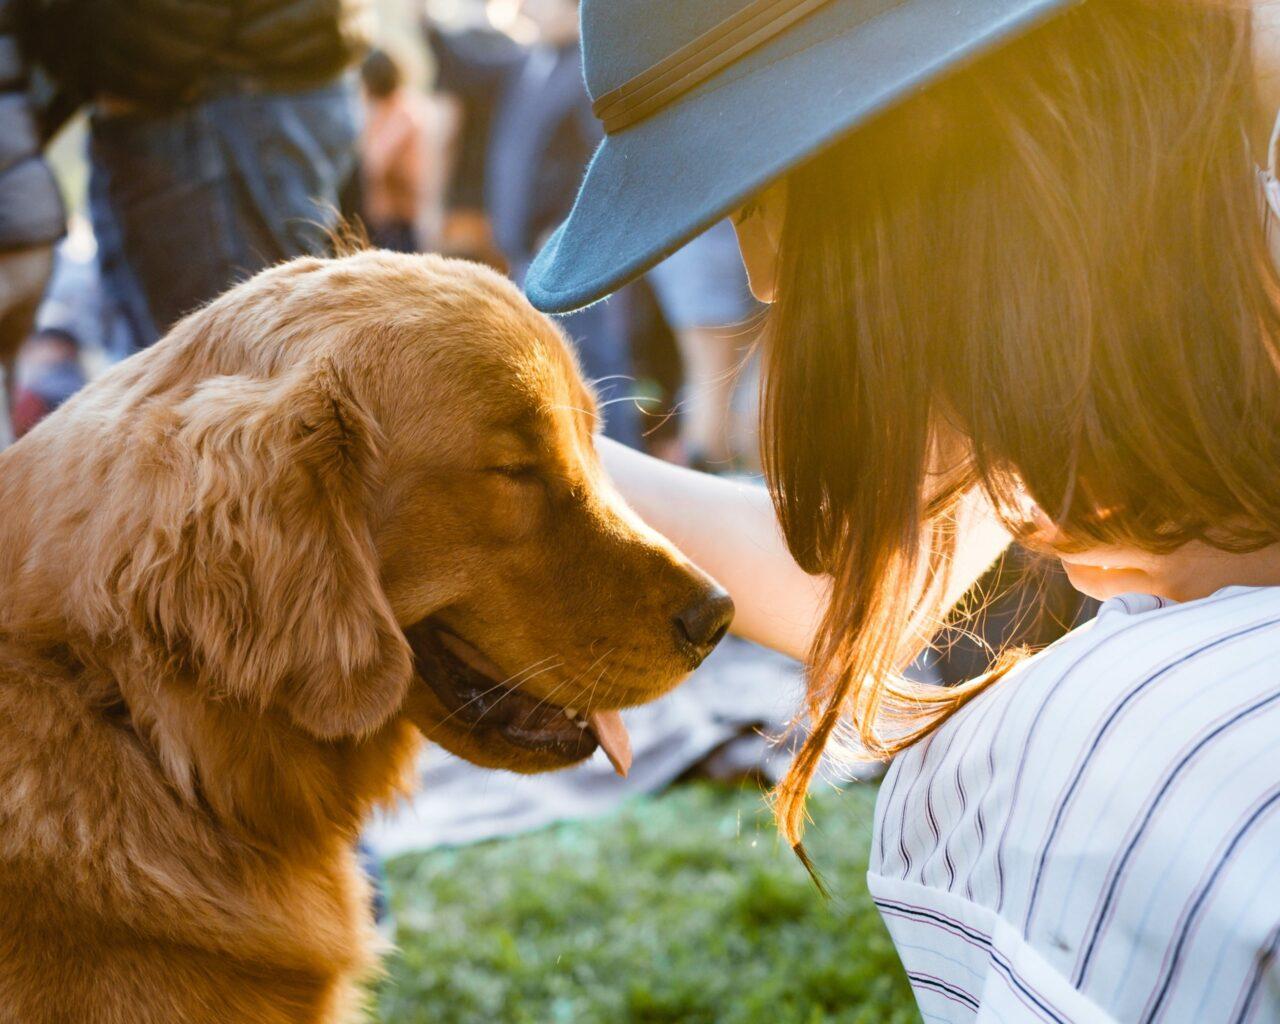 https://ilovemydogsomuch.com/wp-content/uploads/2021/03/happy-dog-1280x1024.jpg